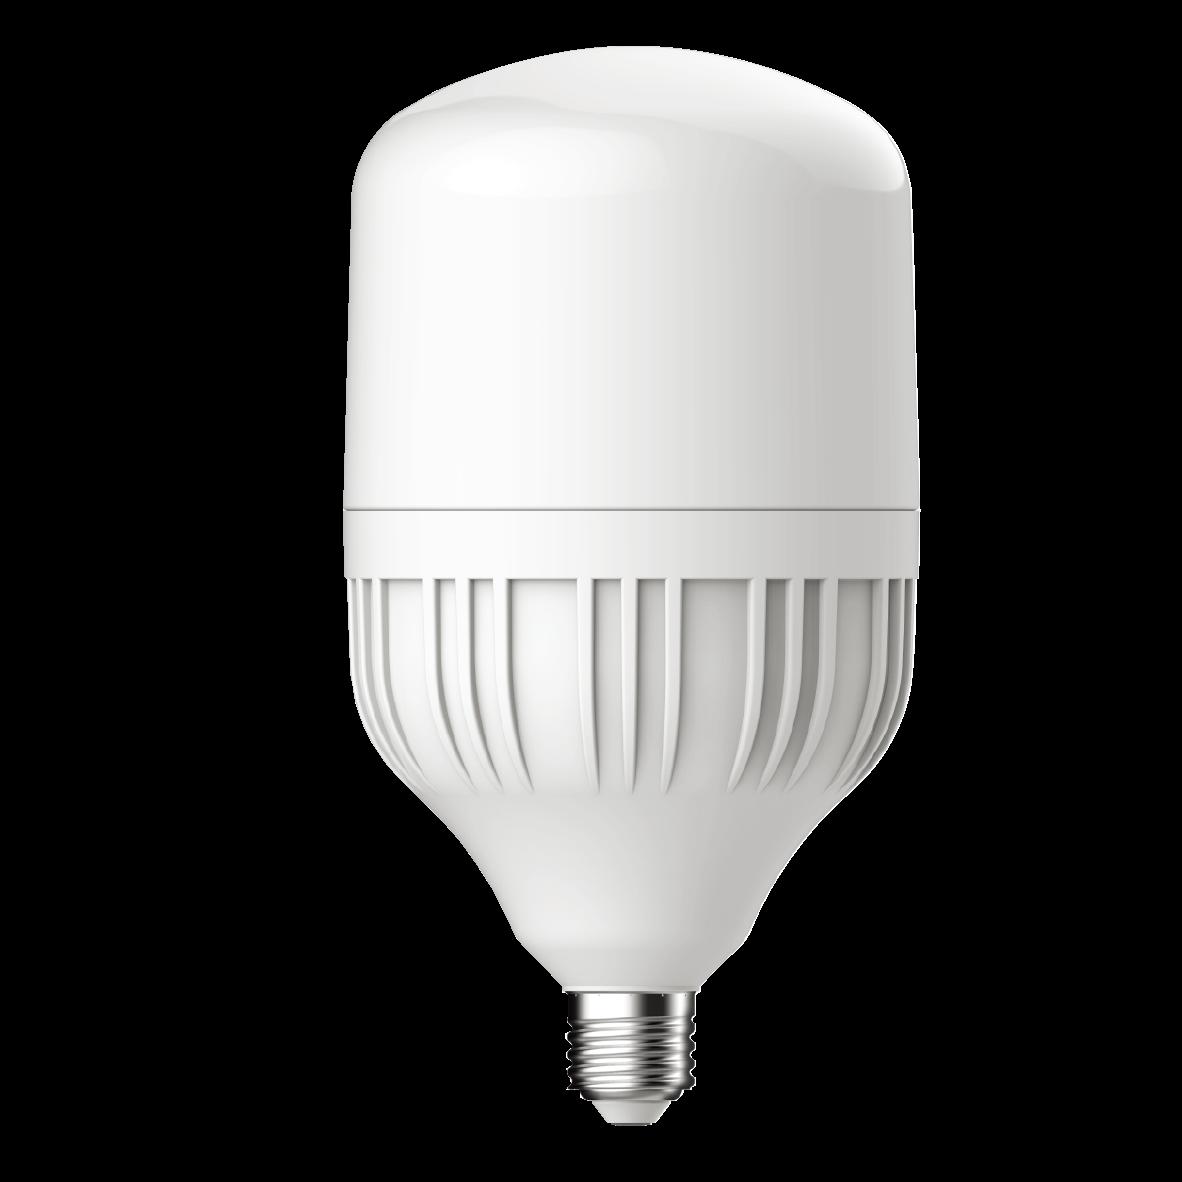 LED燈泡種類:LED大麥克燈泡